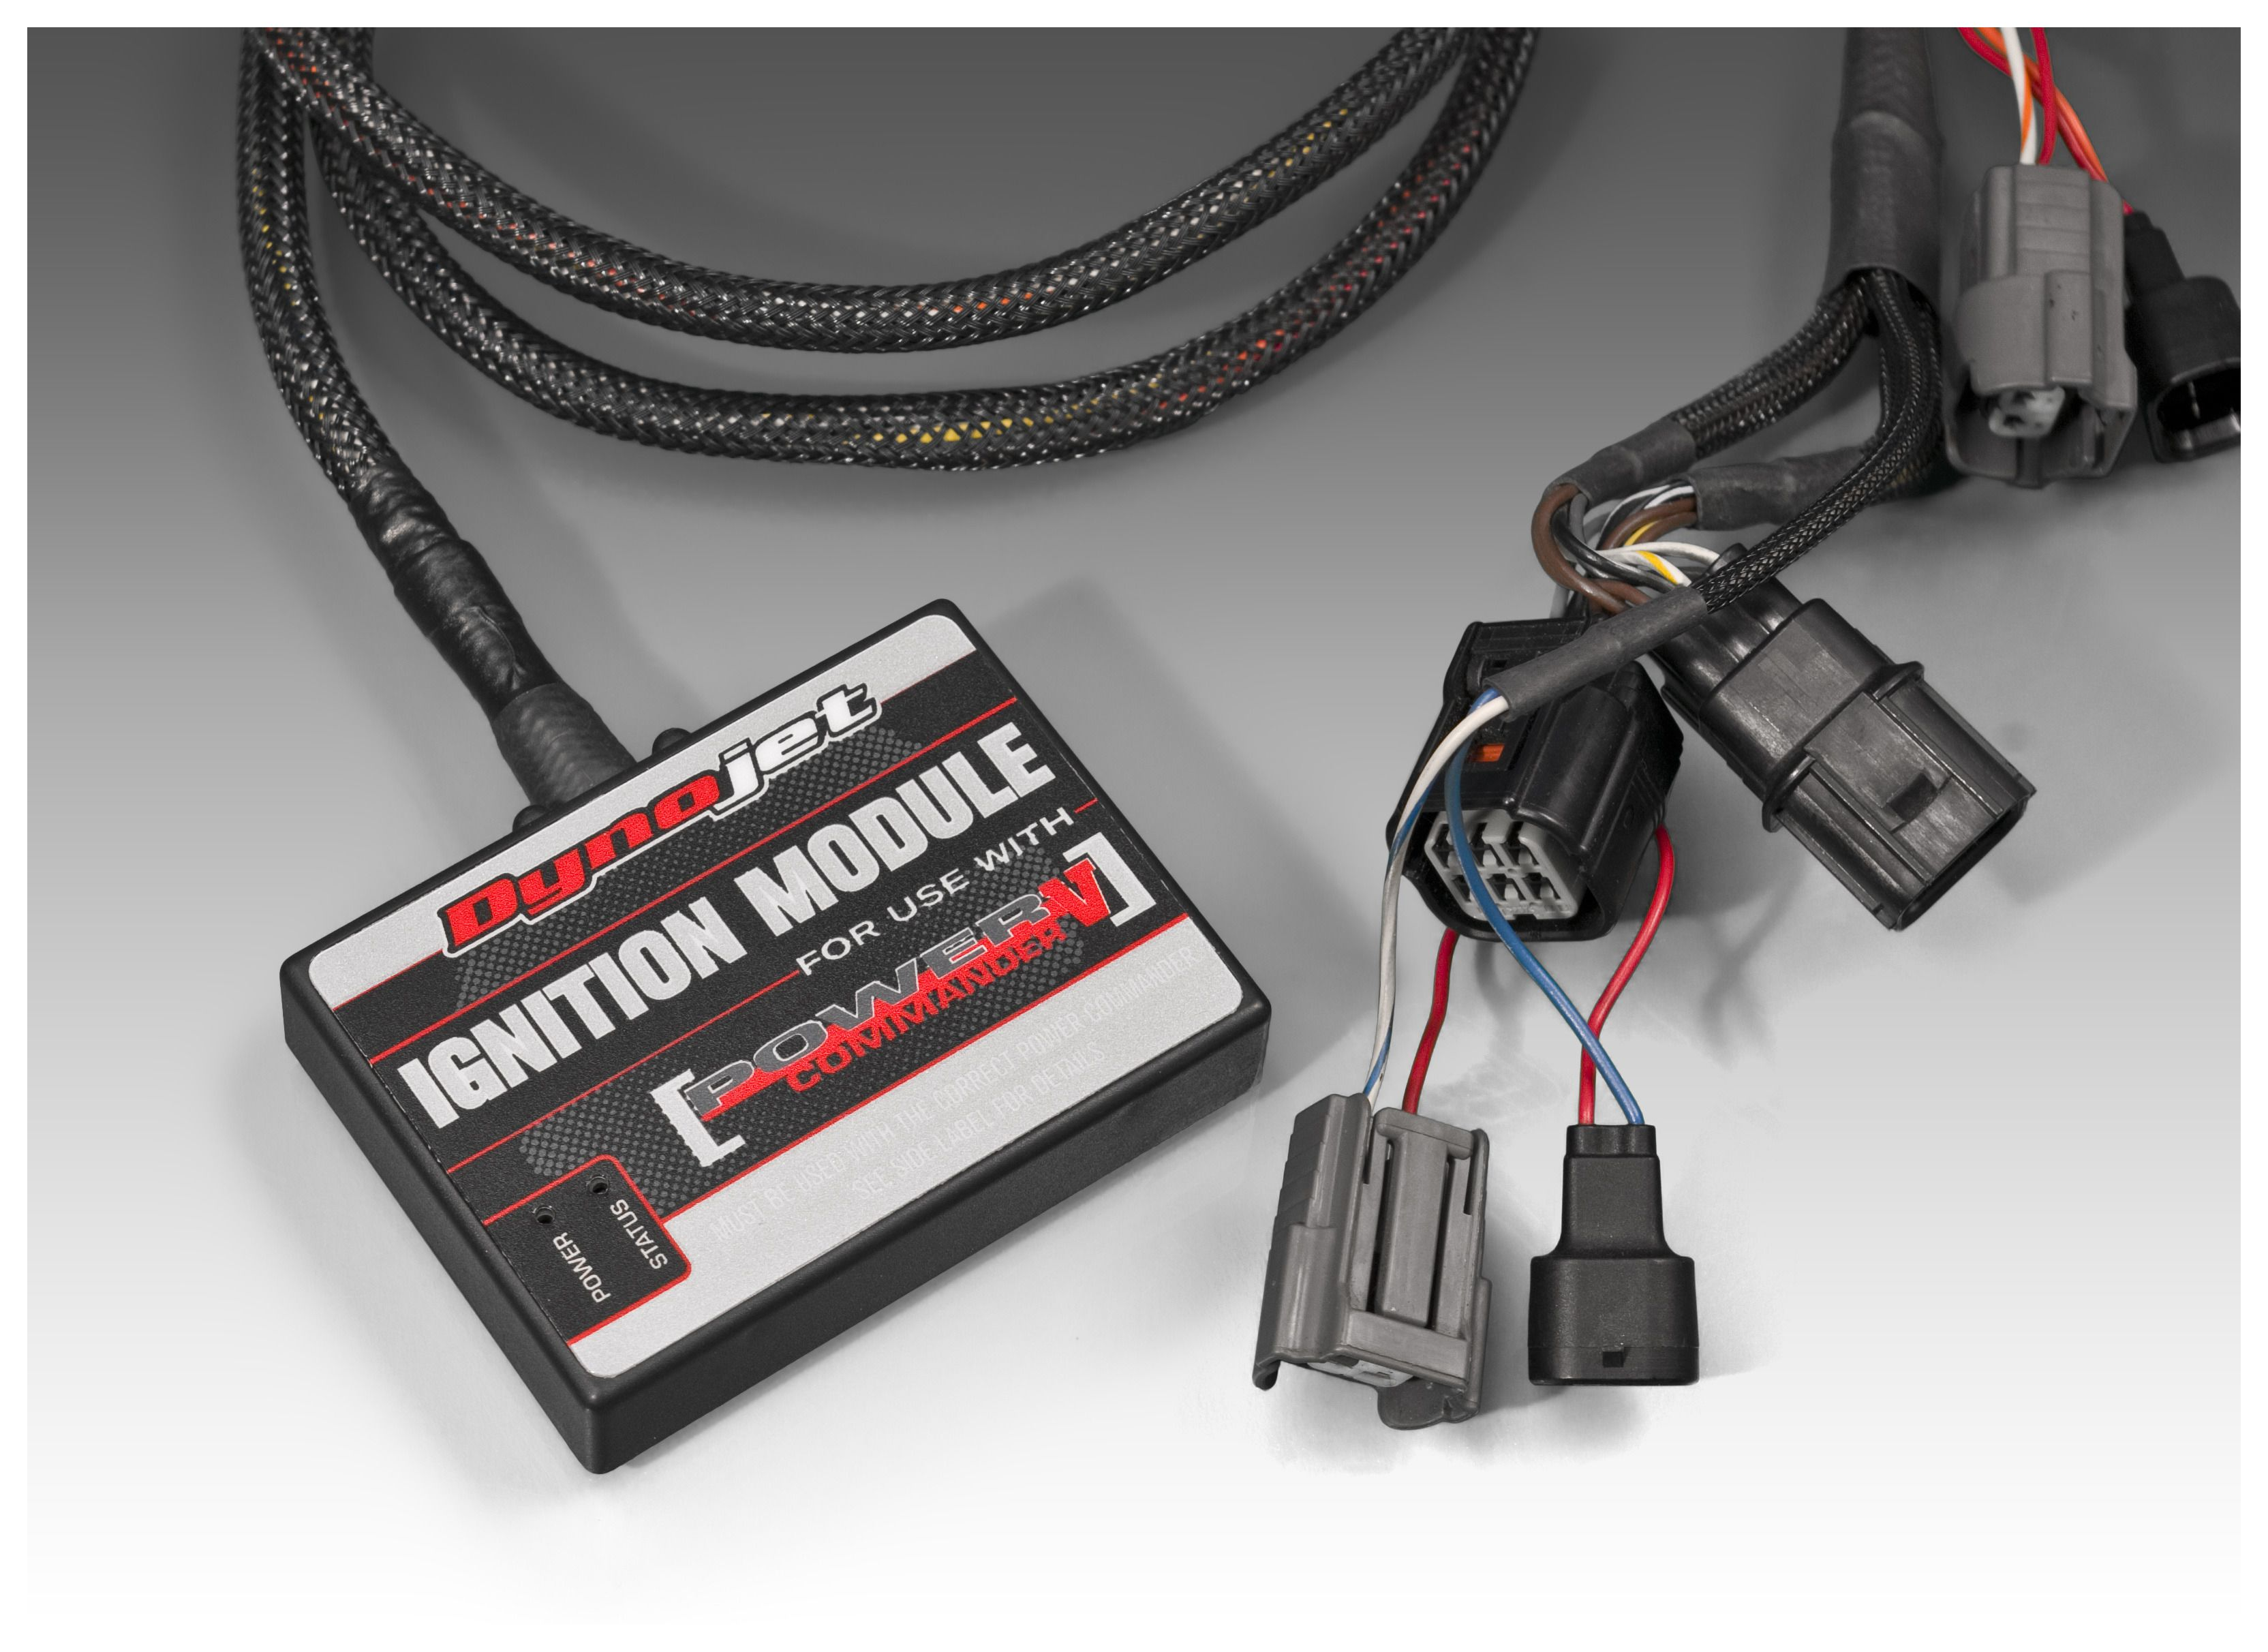 Kawasaki Mojave Wiring Diagram Wiring Diagram Photos For Help Your